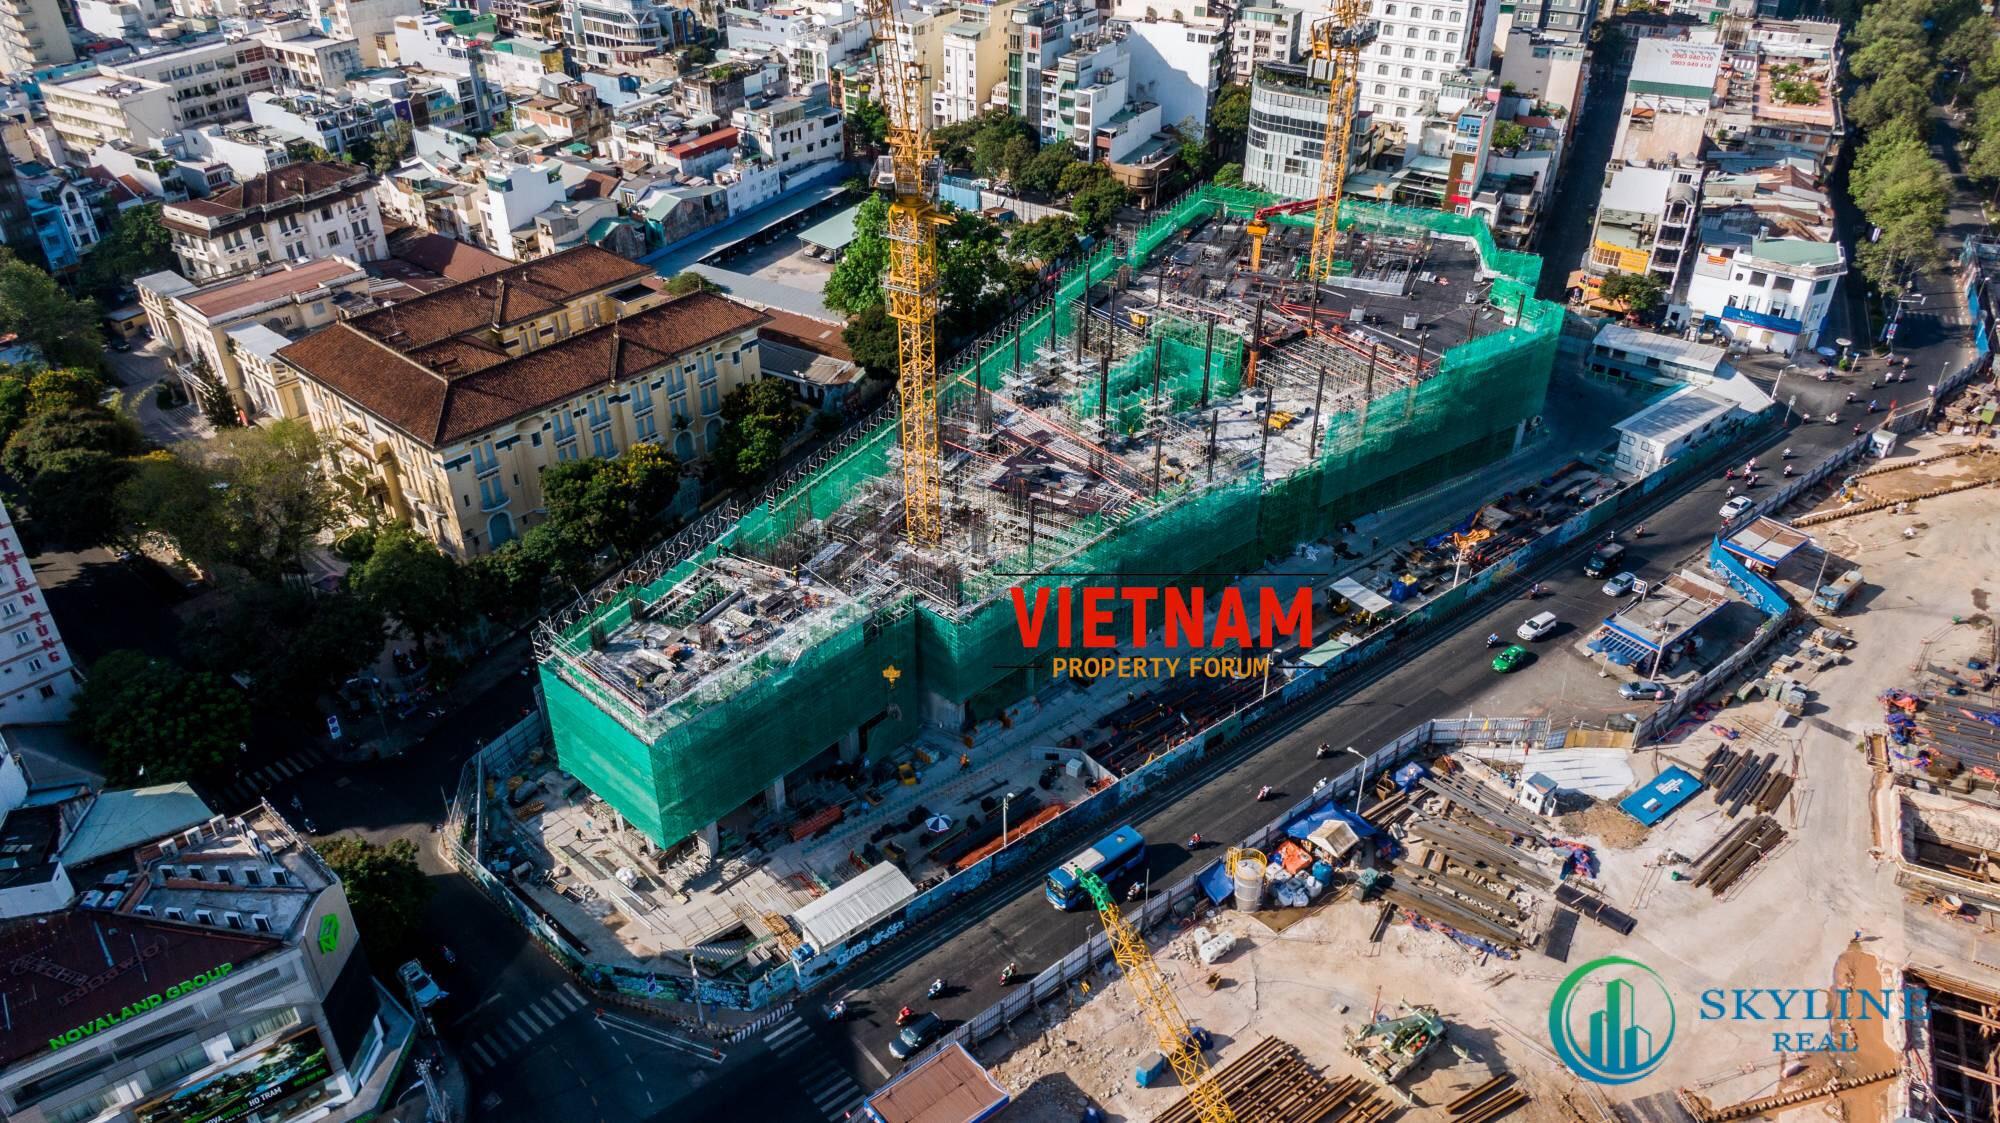 Tiến độ dự án Ritz Carlton Saigon (Nguồn VietNam Property Forum)